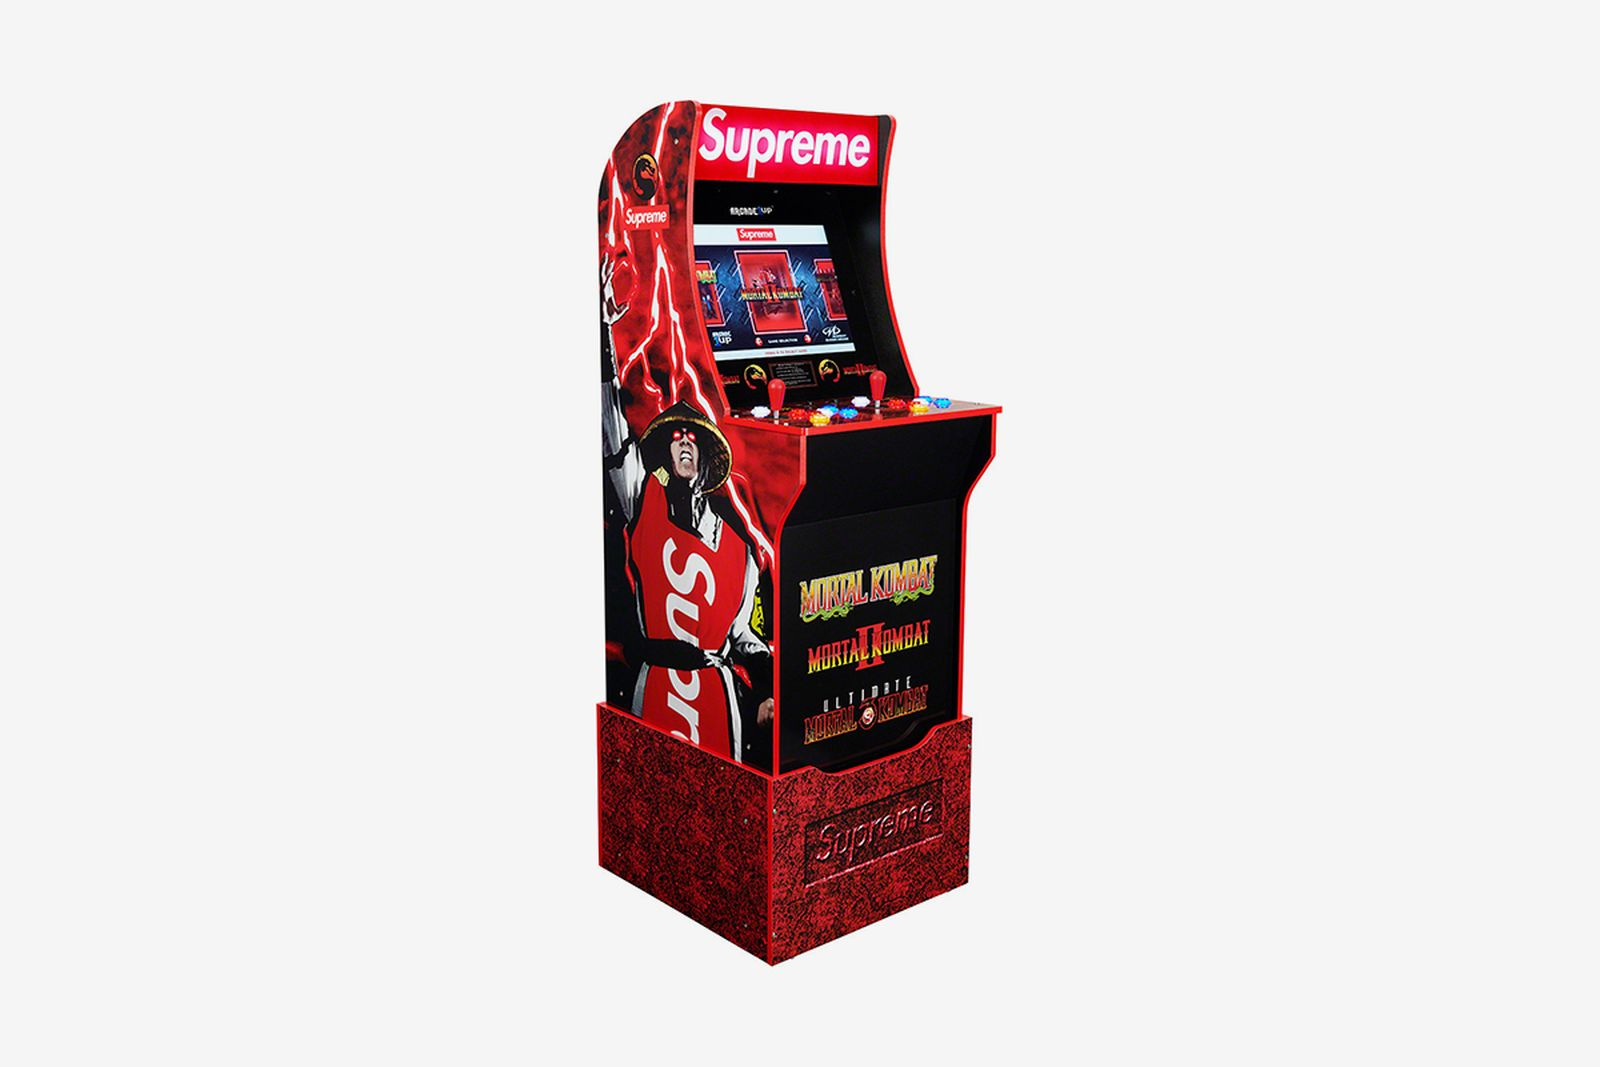 supreme-mortal-kombat-arcade-cabinet-01